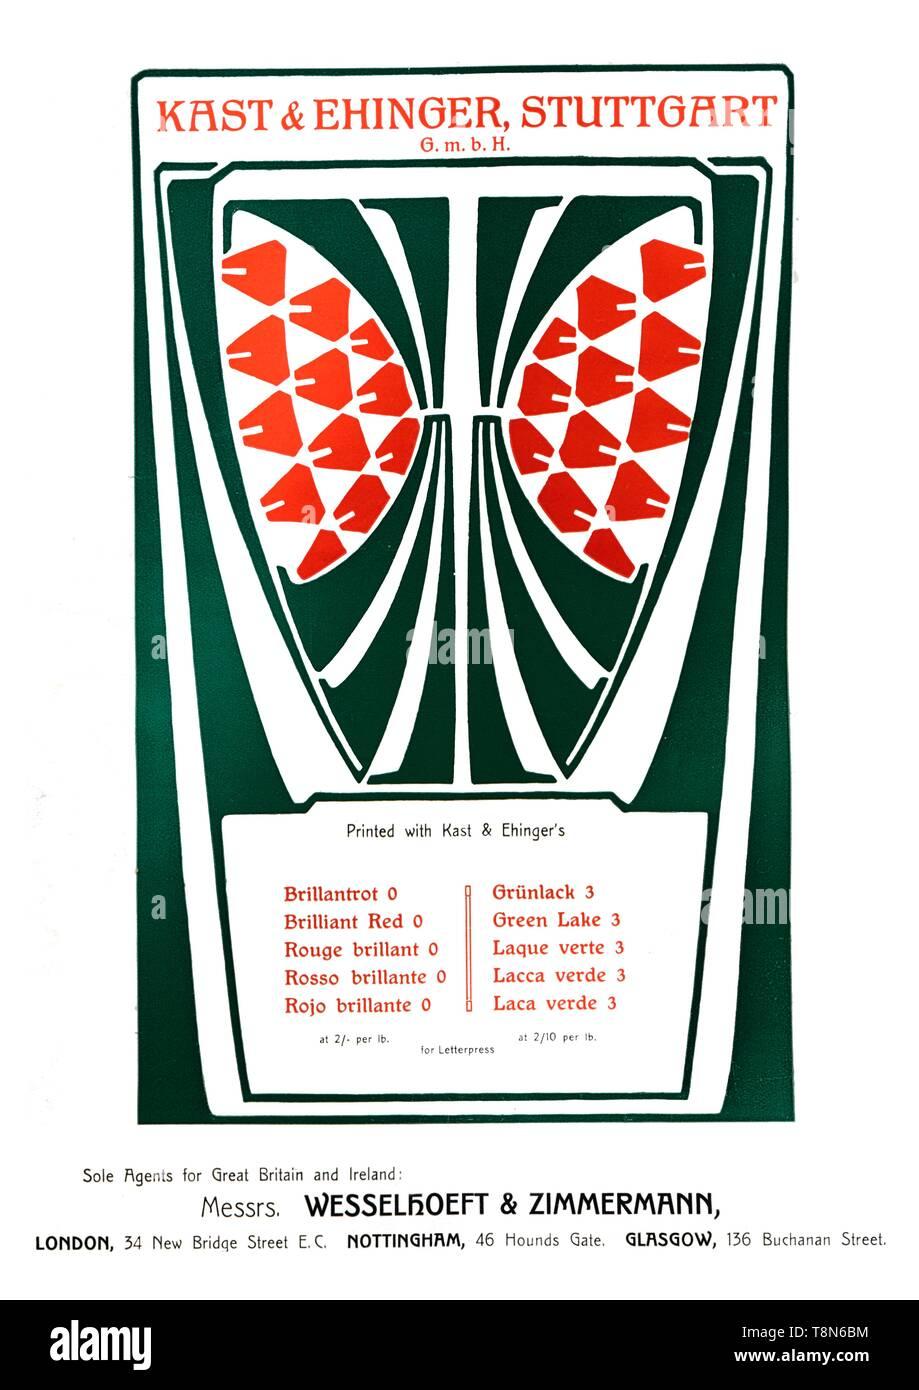 Kast Ehinger Stuttgart Advertisement 1909 Creator